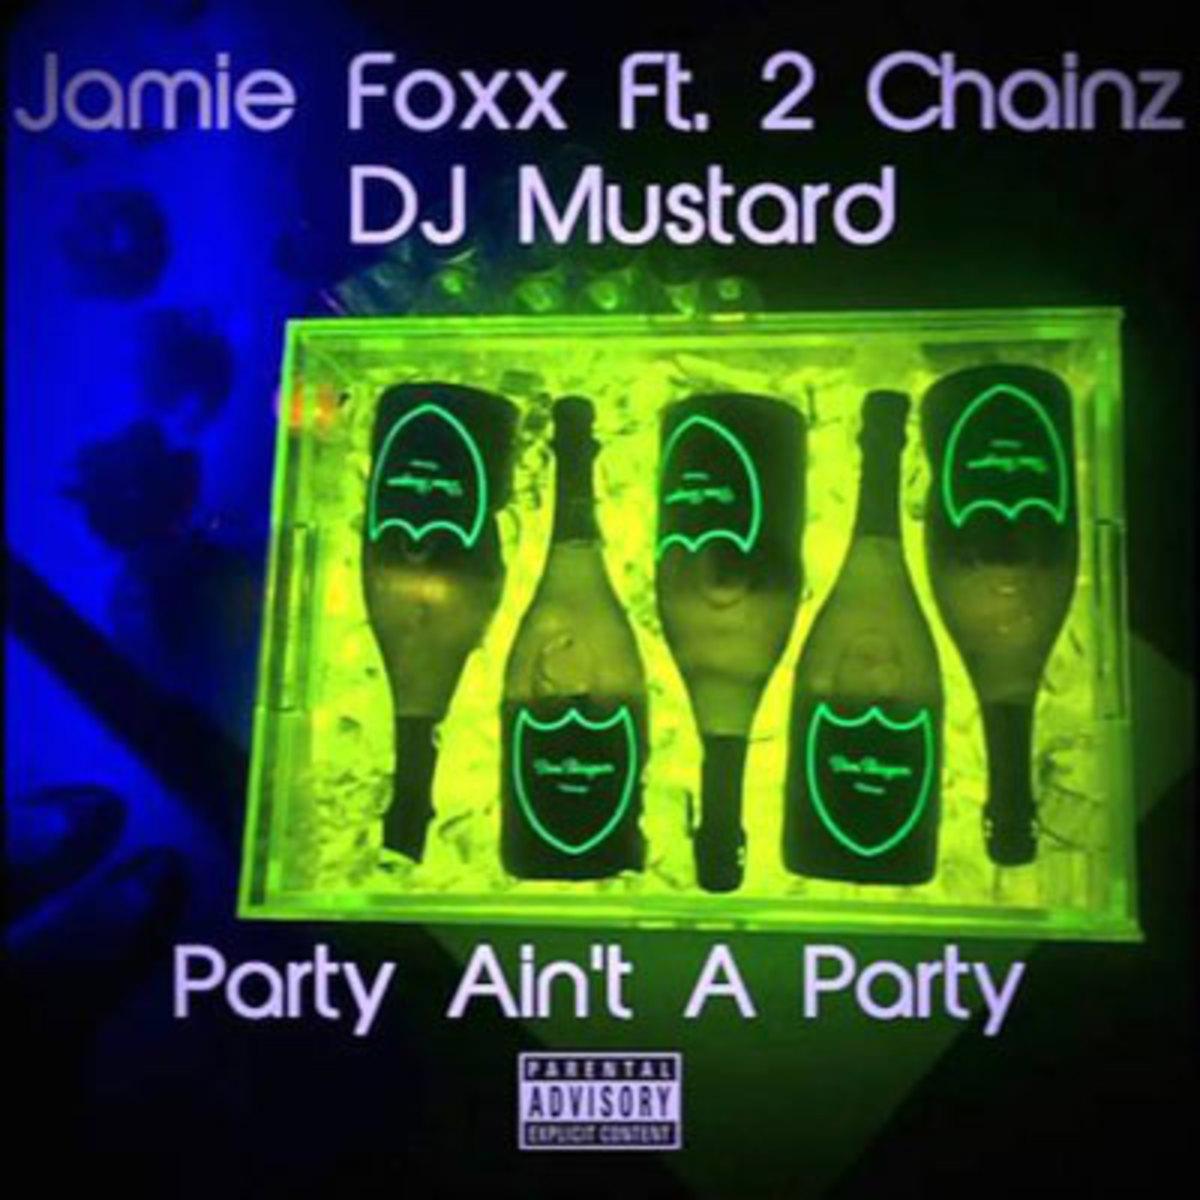 jamiefoxx-partyaintaparty.jpg